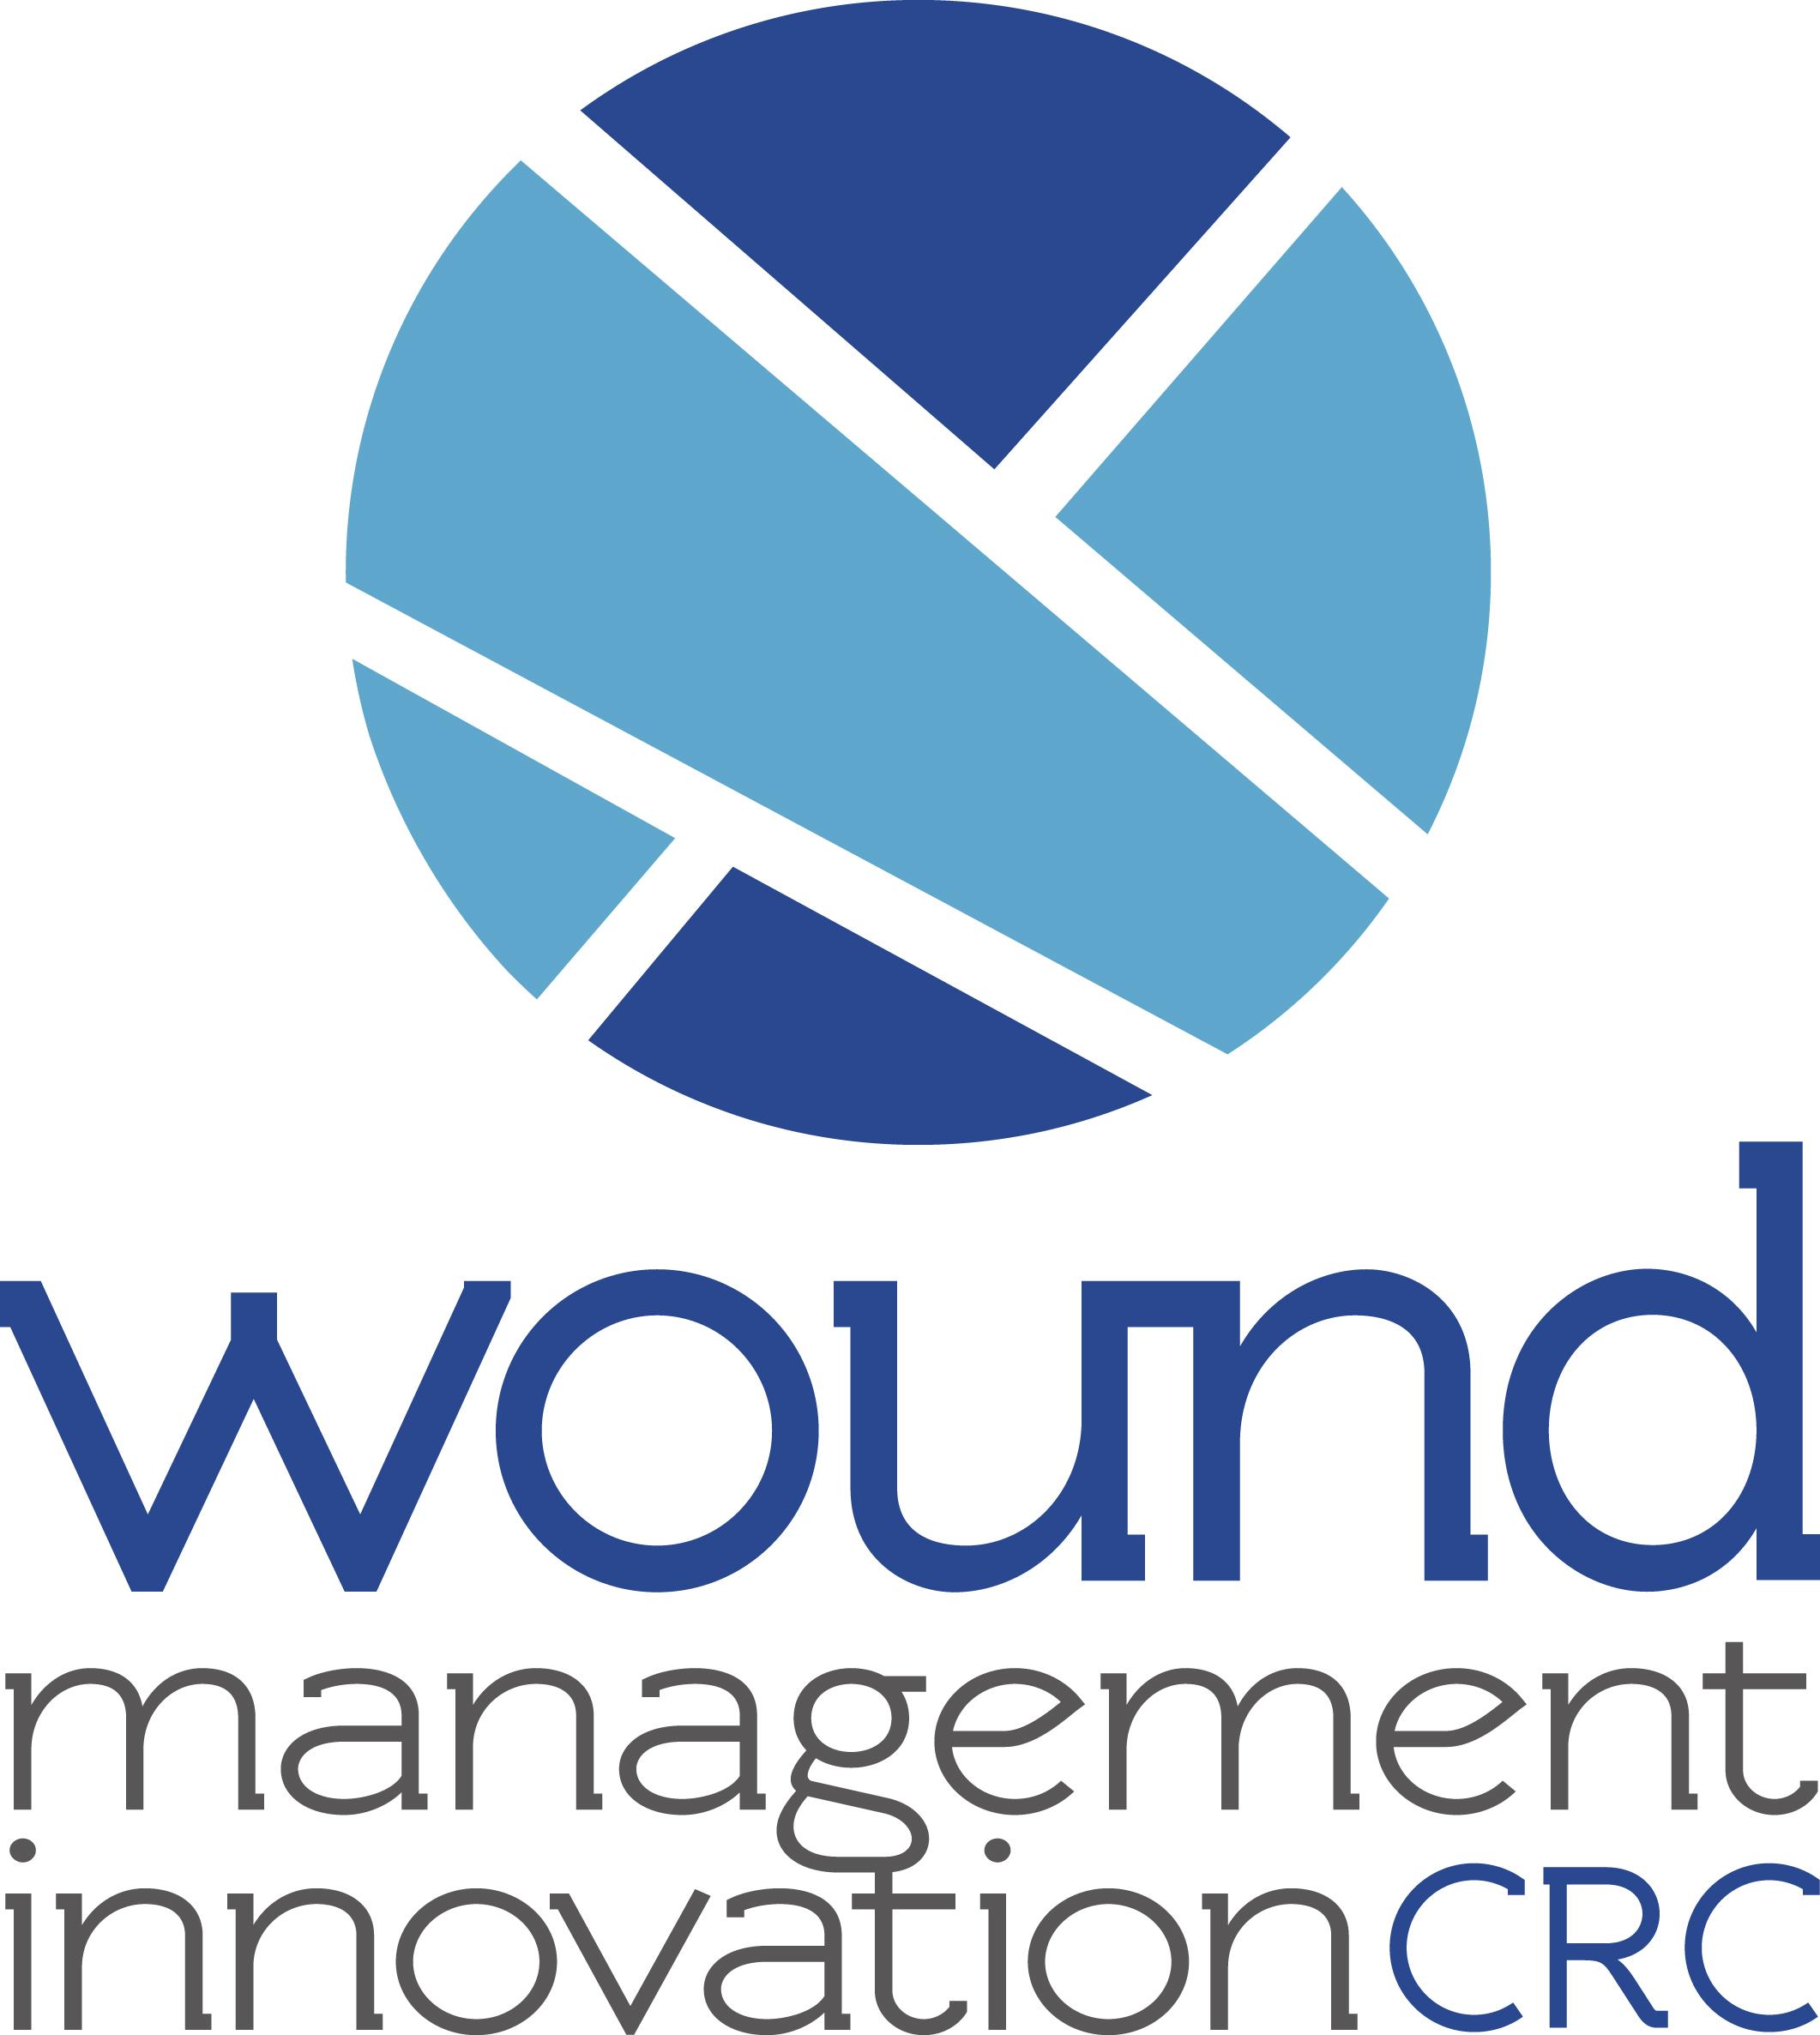 Wound Management Innovation CRC logo